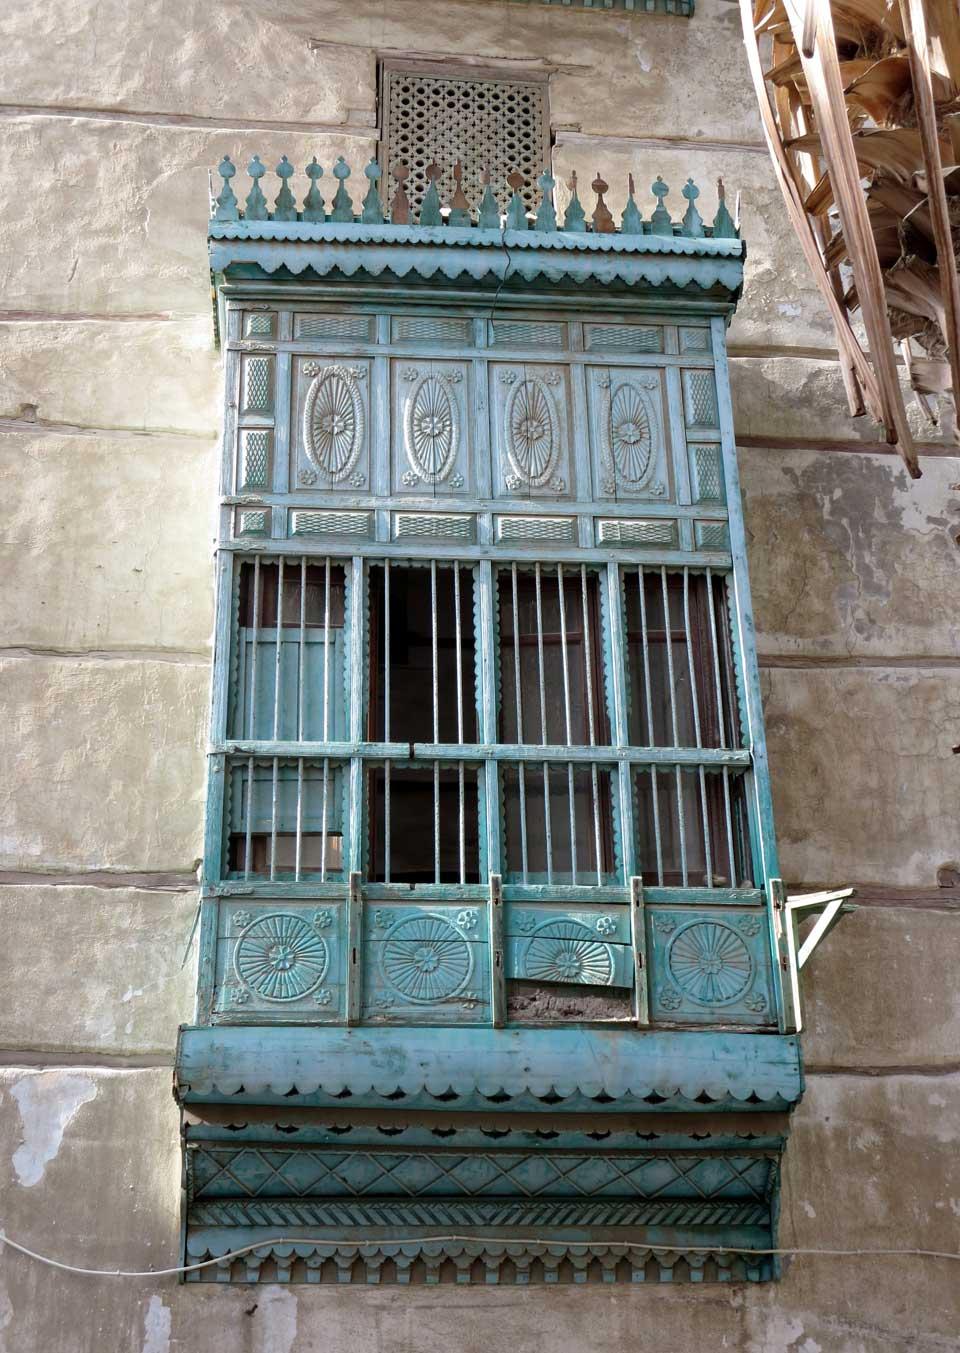 Al-Balad's beautiful craftsmanship. © Mark Lowey